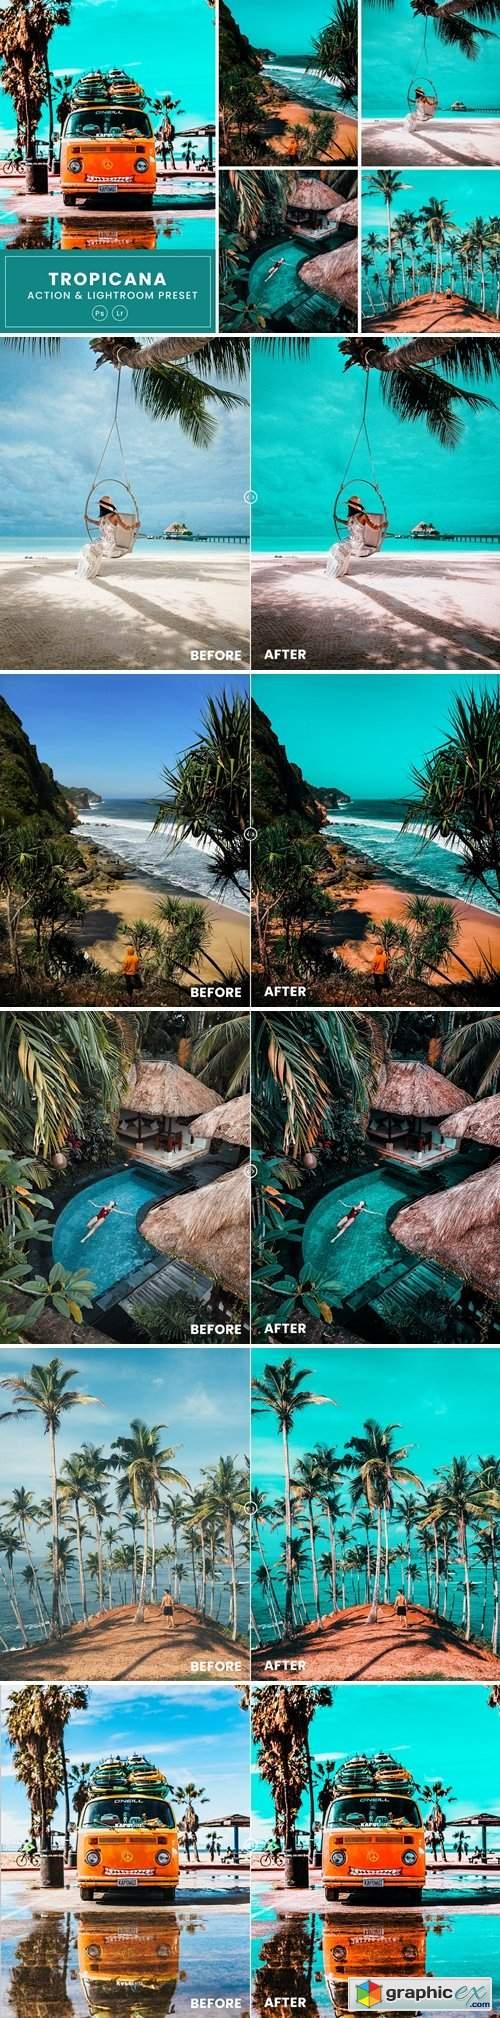 Tropicana Photoshop Action & Lightrom Presets